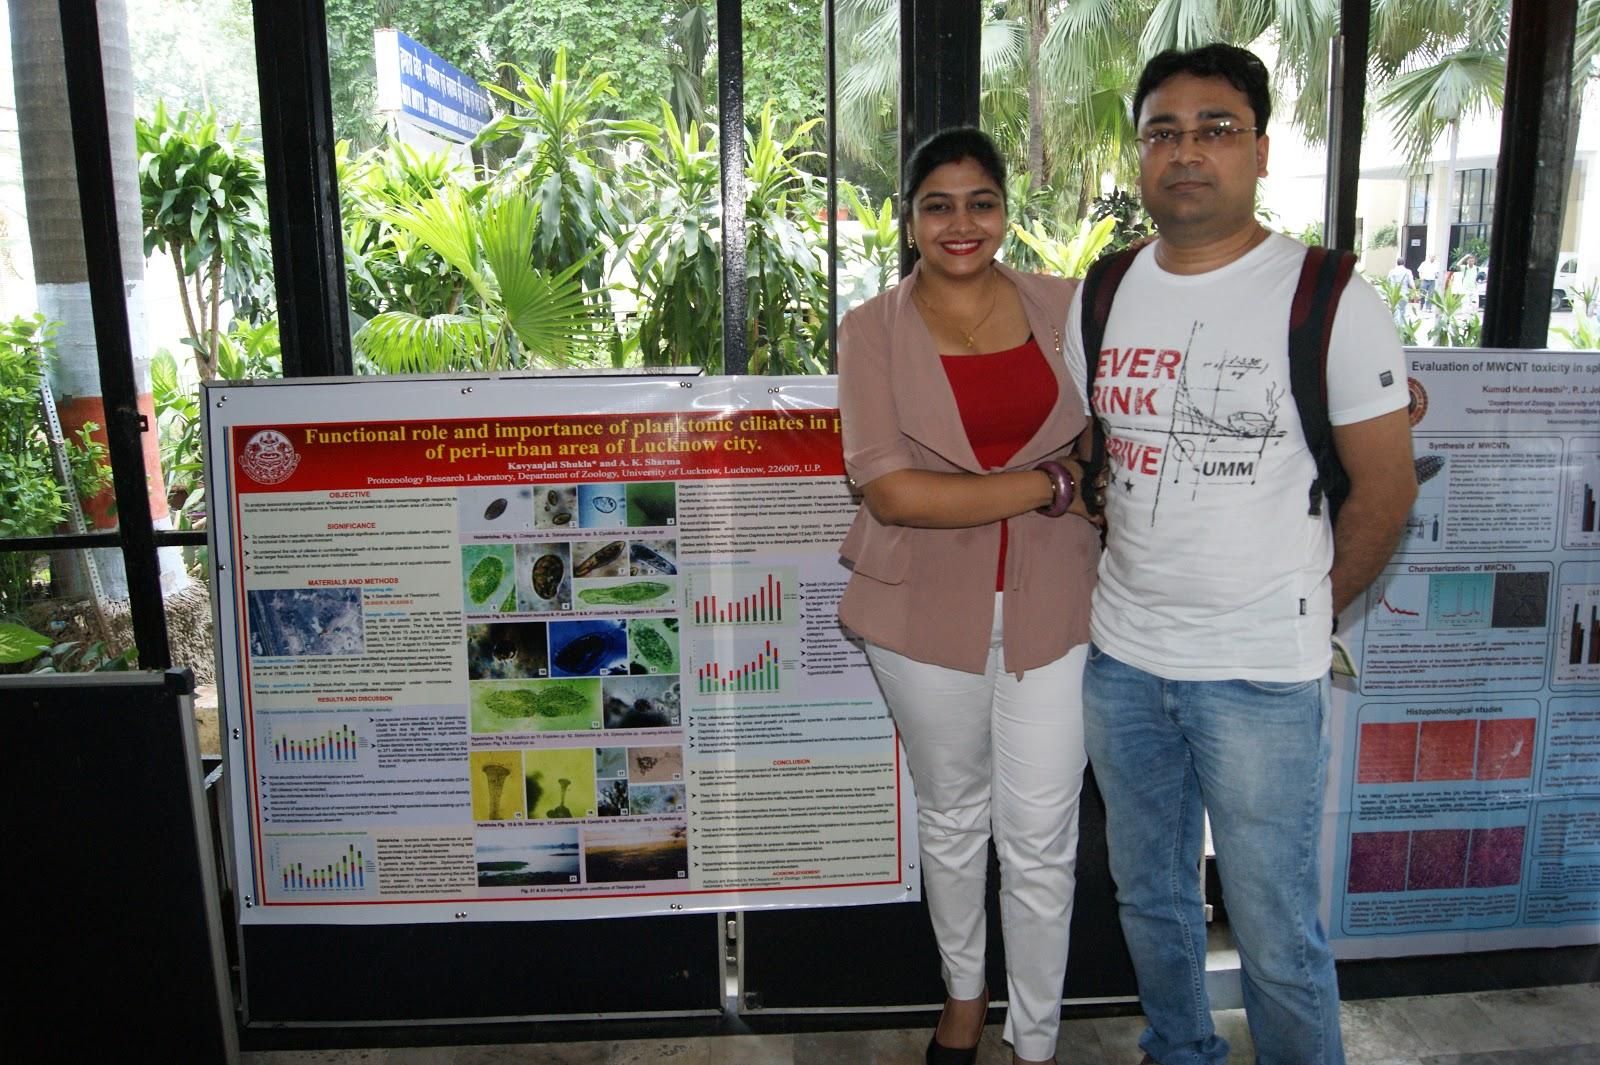 Presenting a research paper